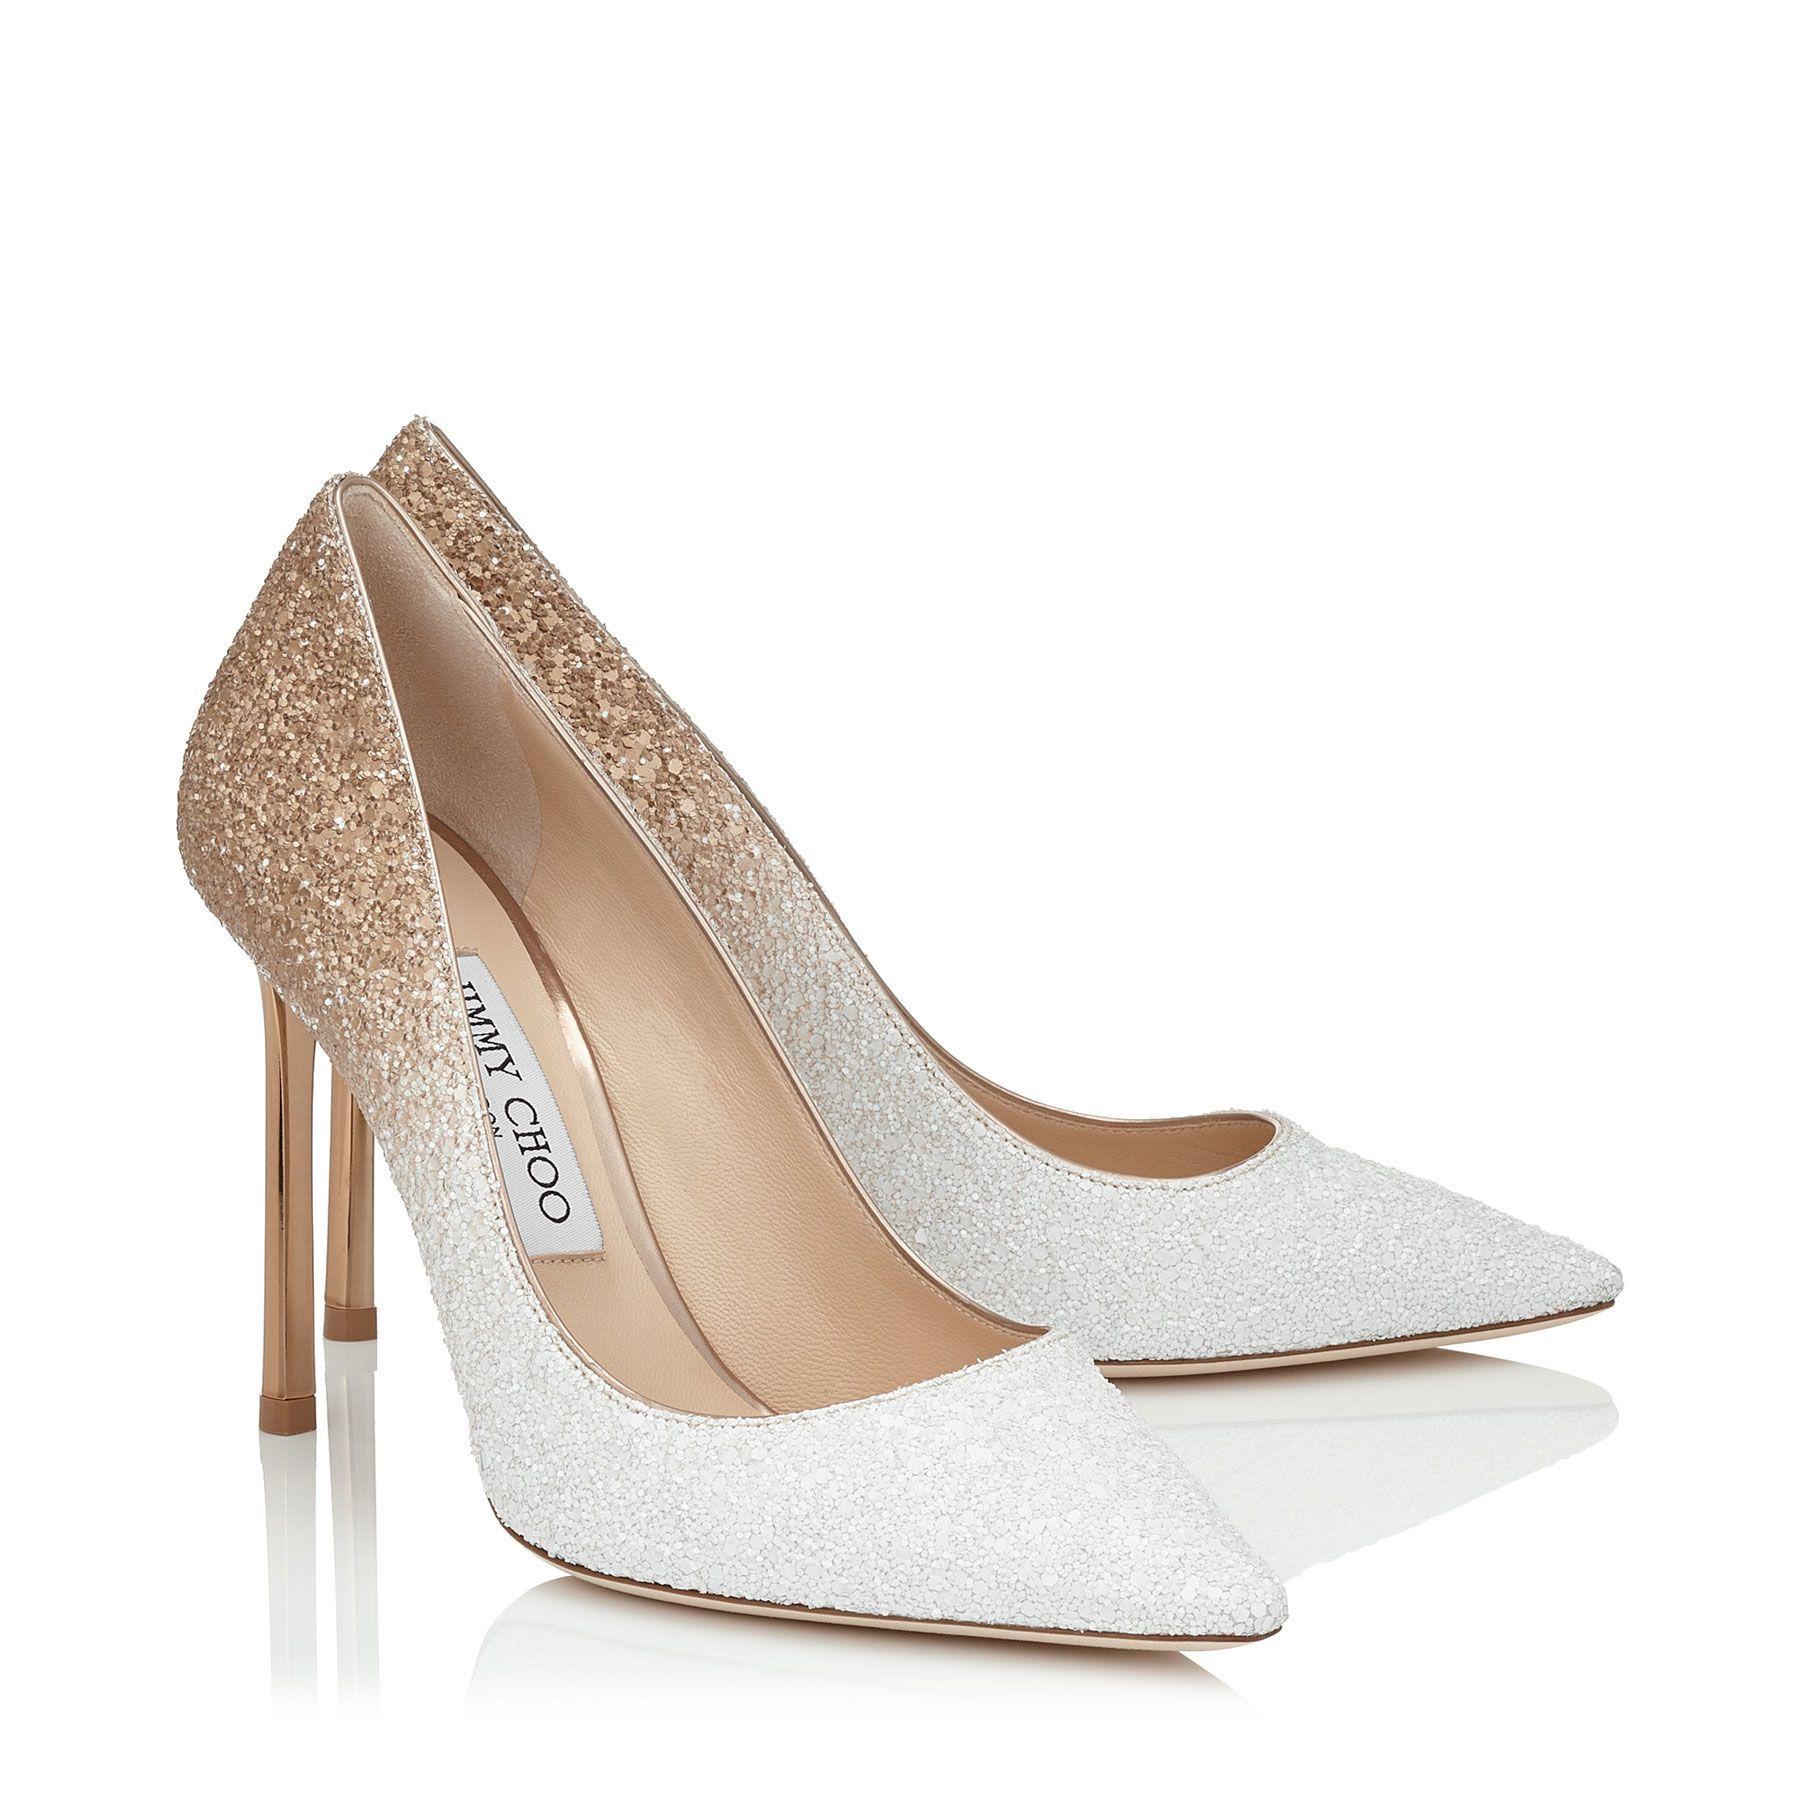 Zapatos de novia 2017  95 pares de ensueño para que conquistes al mundo ¡en  tu boda! c4057dc39746